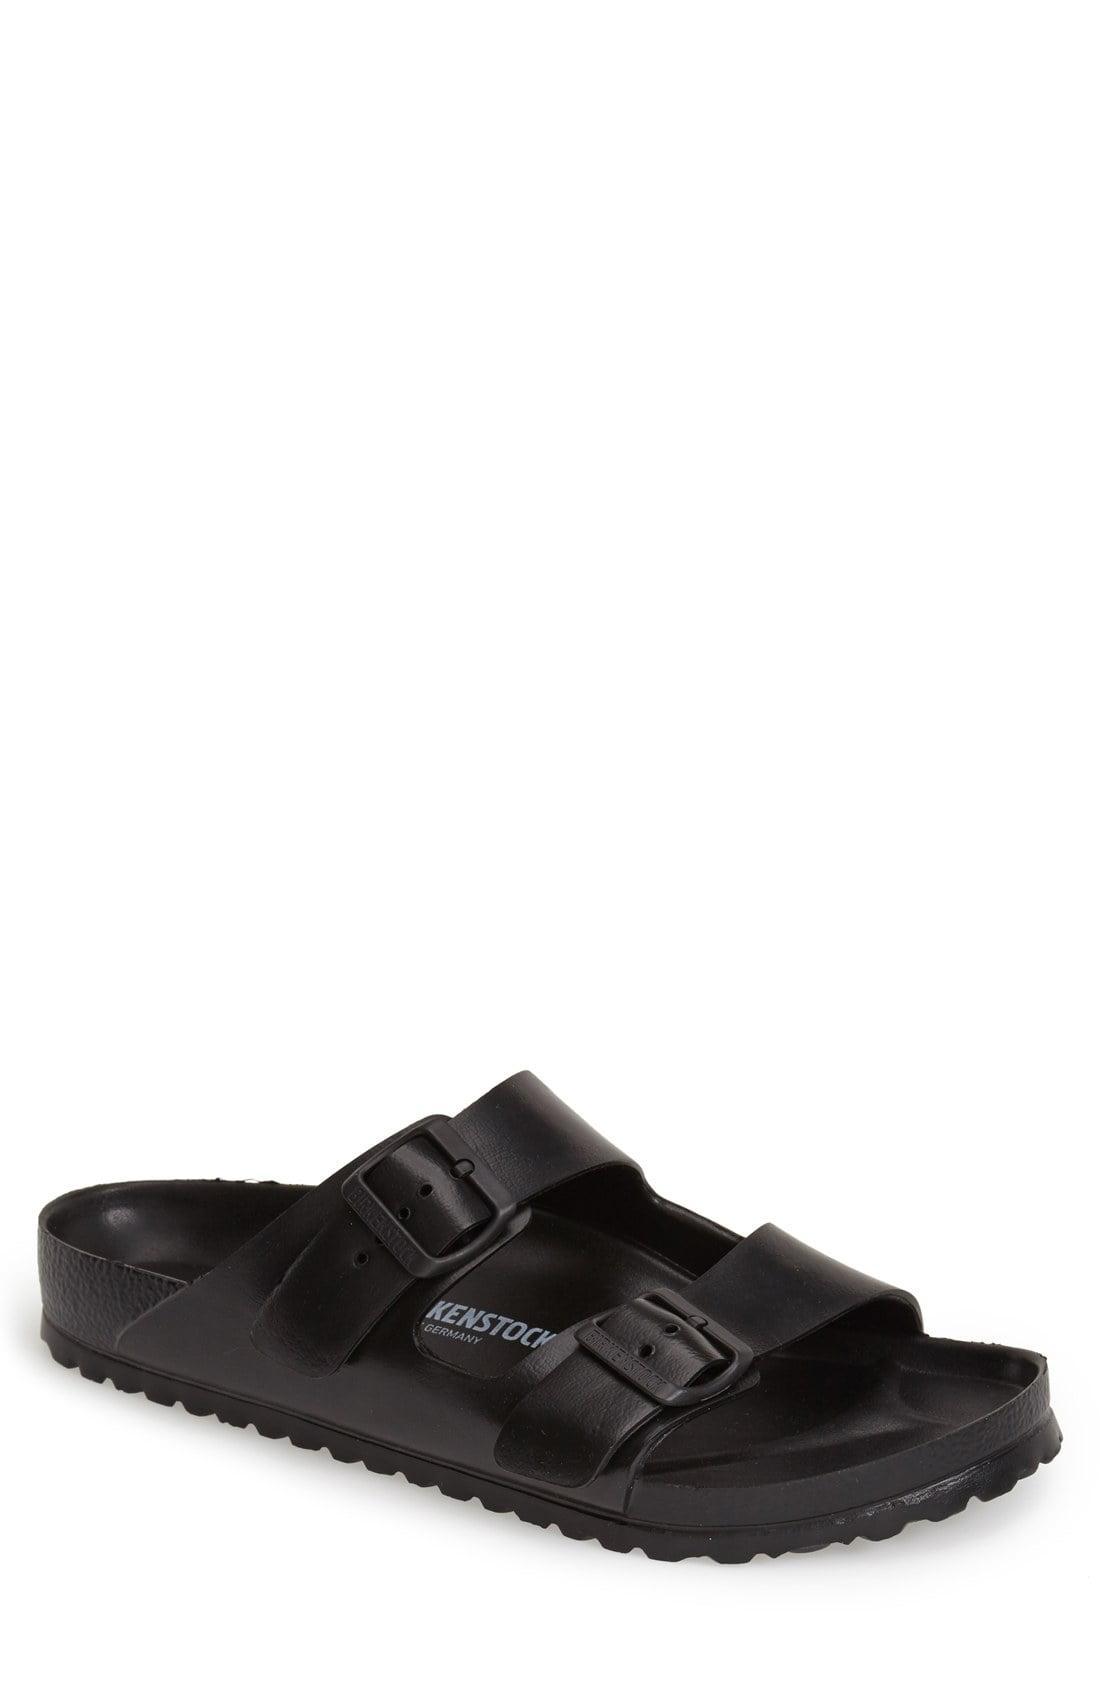 dd9f28de145e Birkenstock - Black Essentials Arizona Eva Waterproof Slide Sandal for Men  - Lyst. View fullscreen